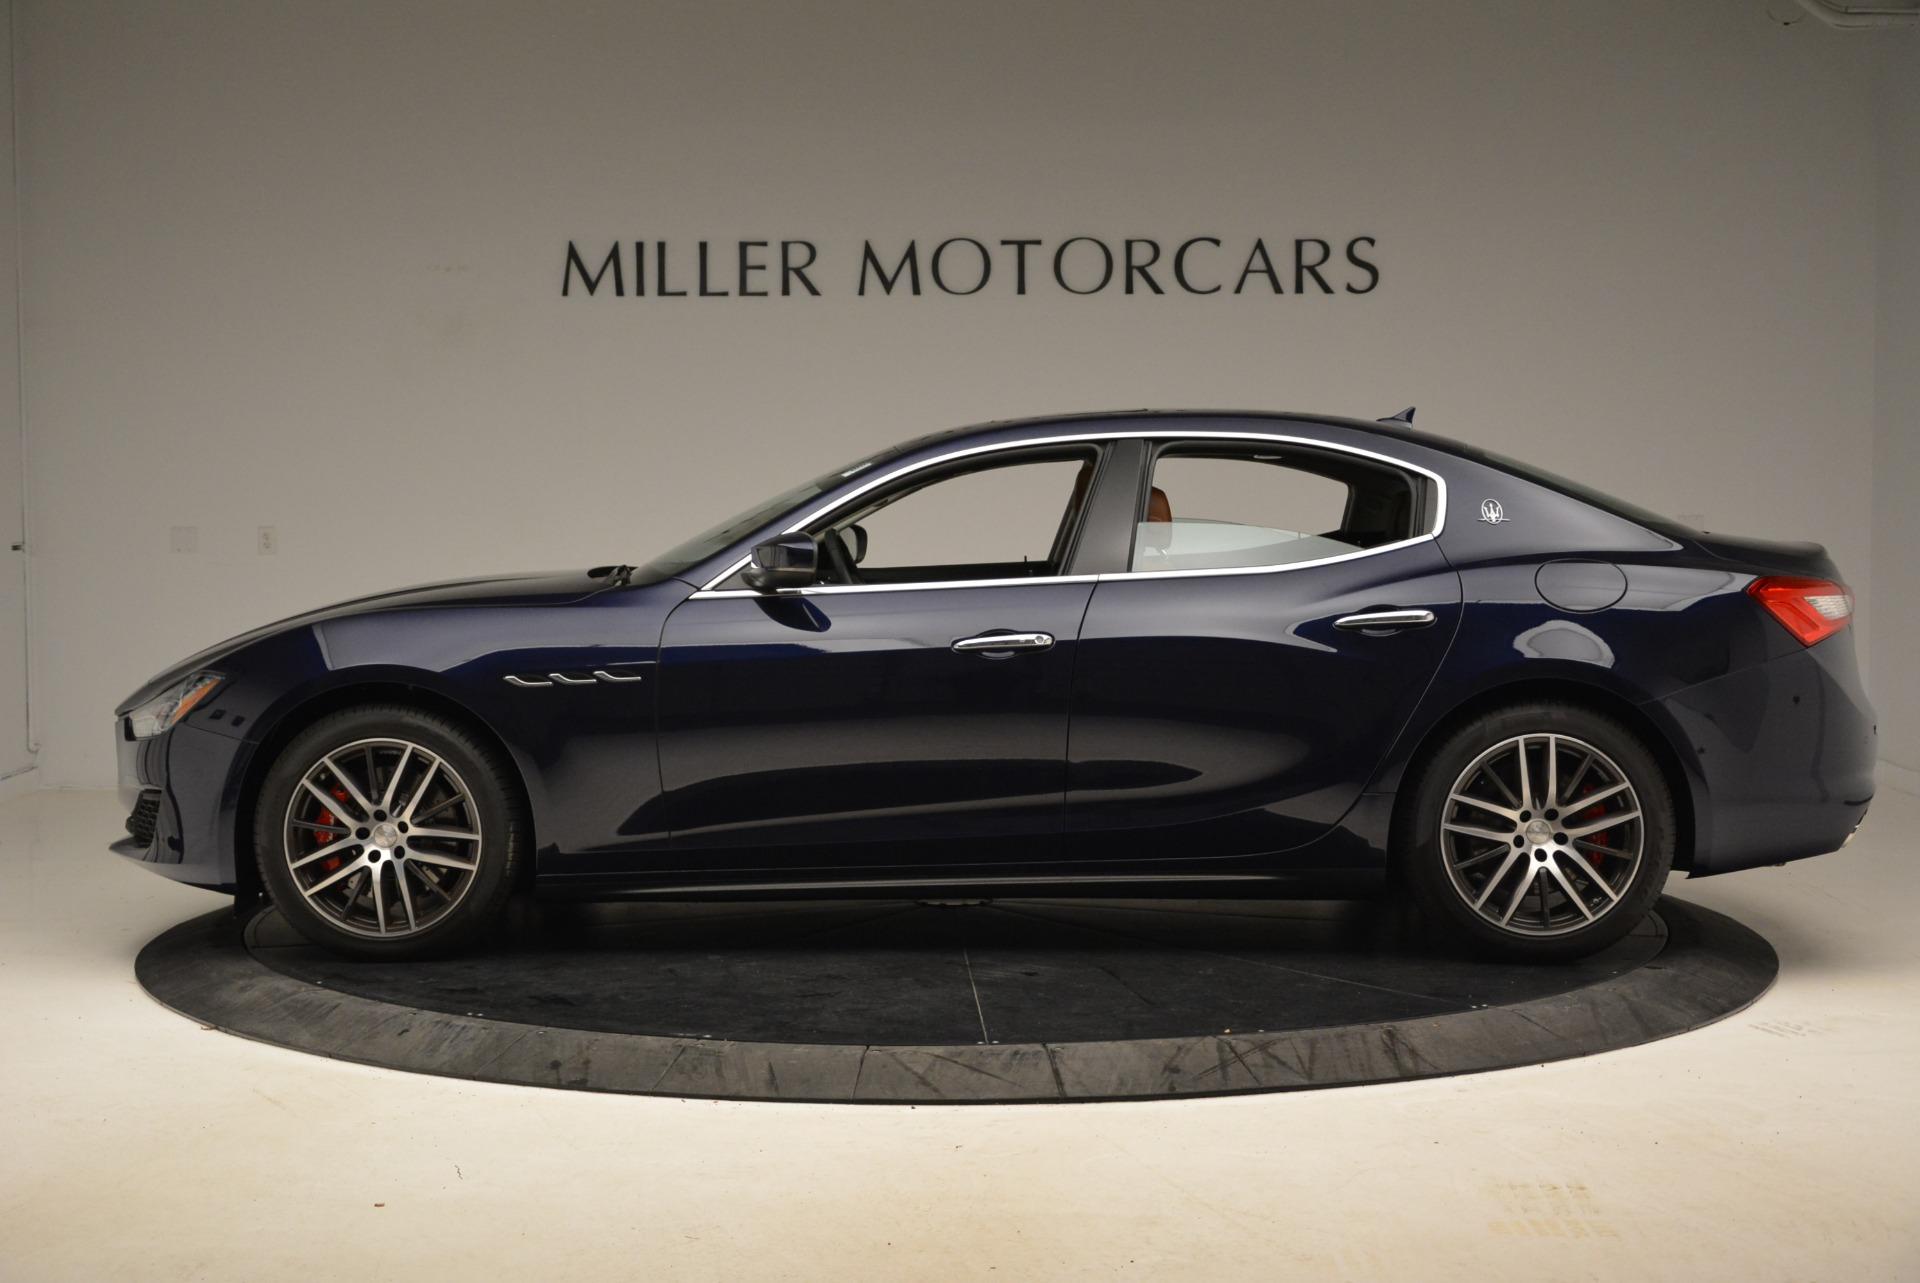 New 2019 Maserati Ghibli S Q4 For Sale 90185 In Greenwich, CT